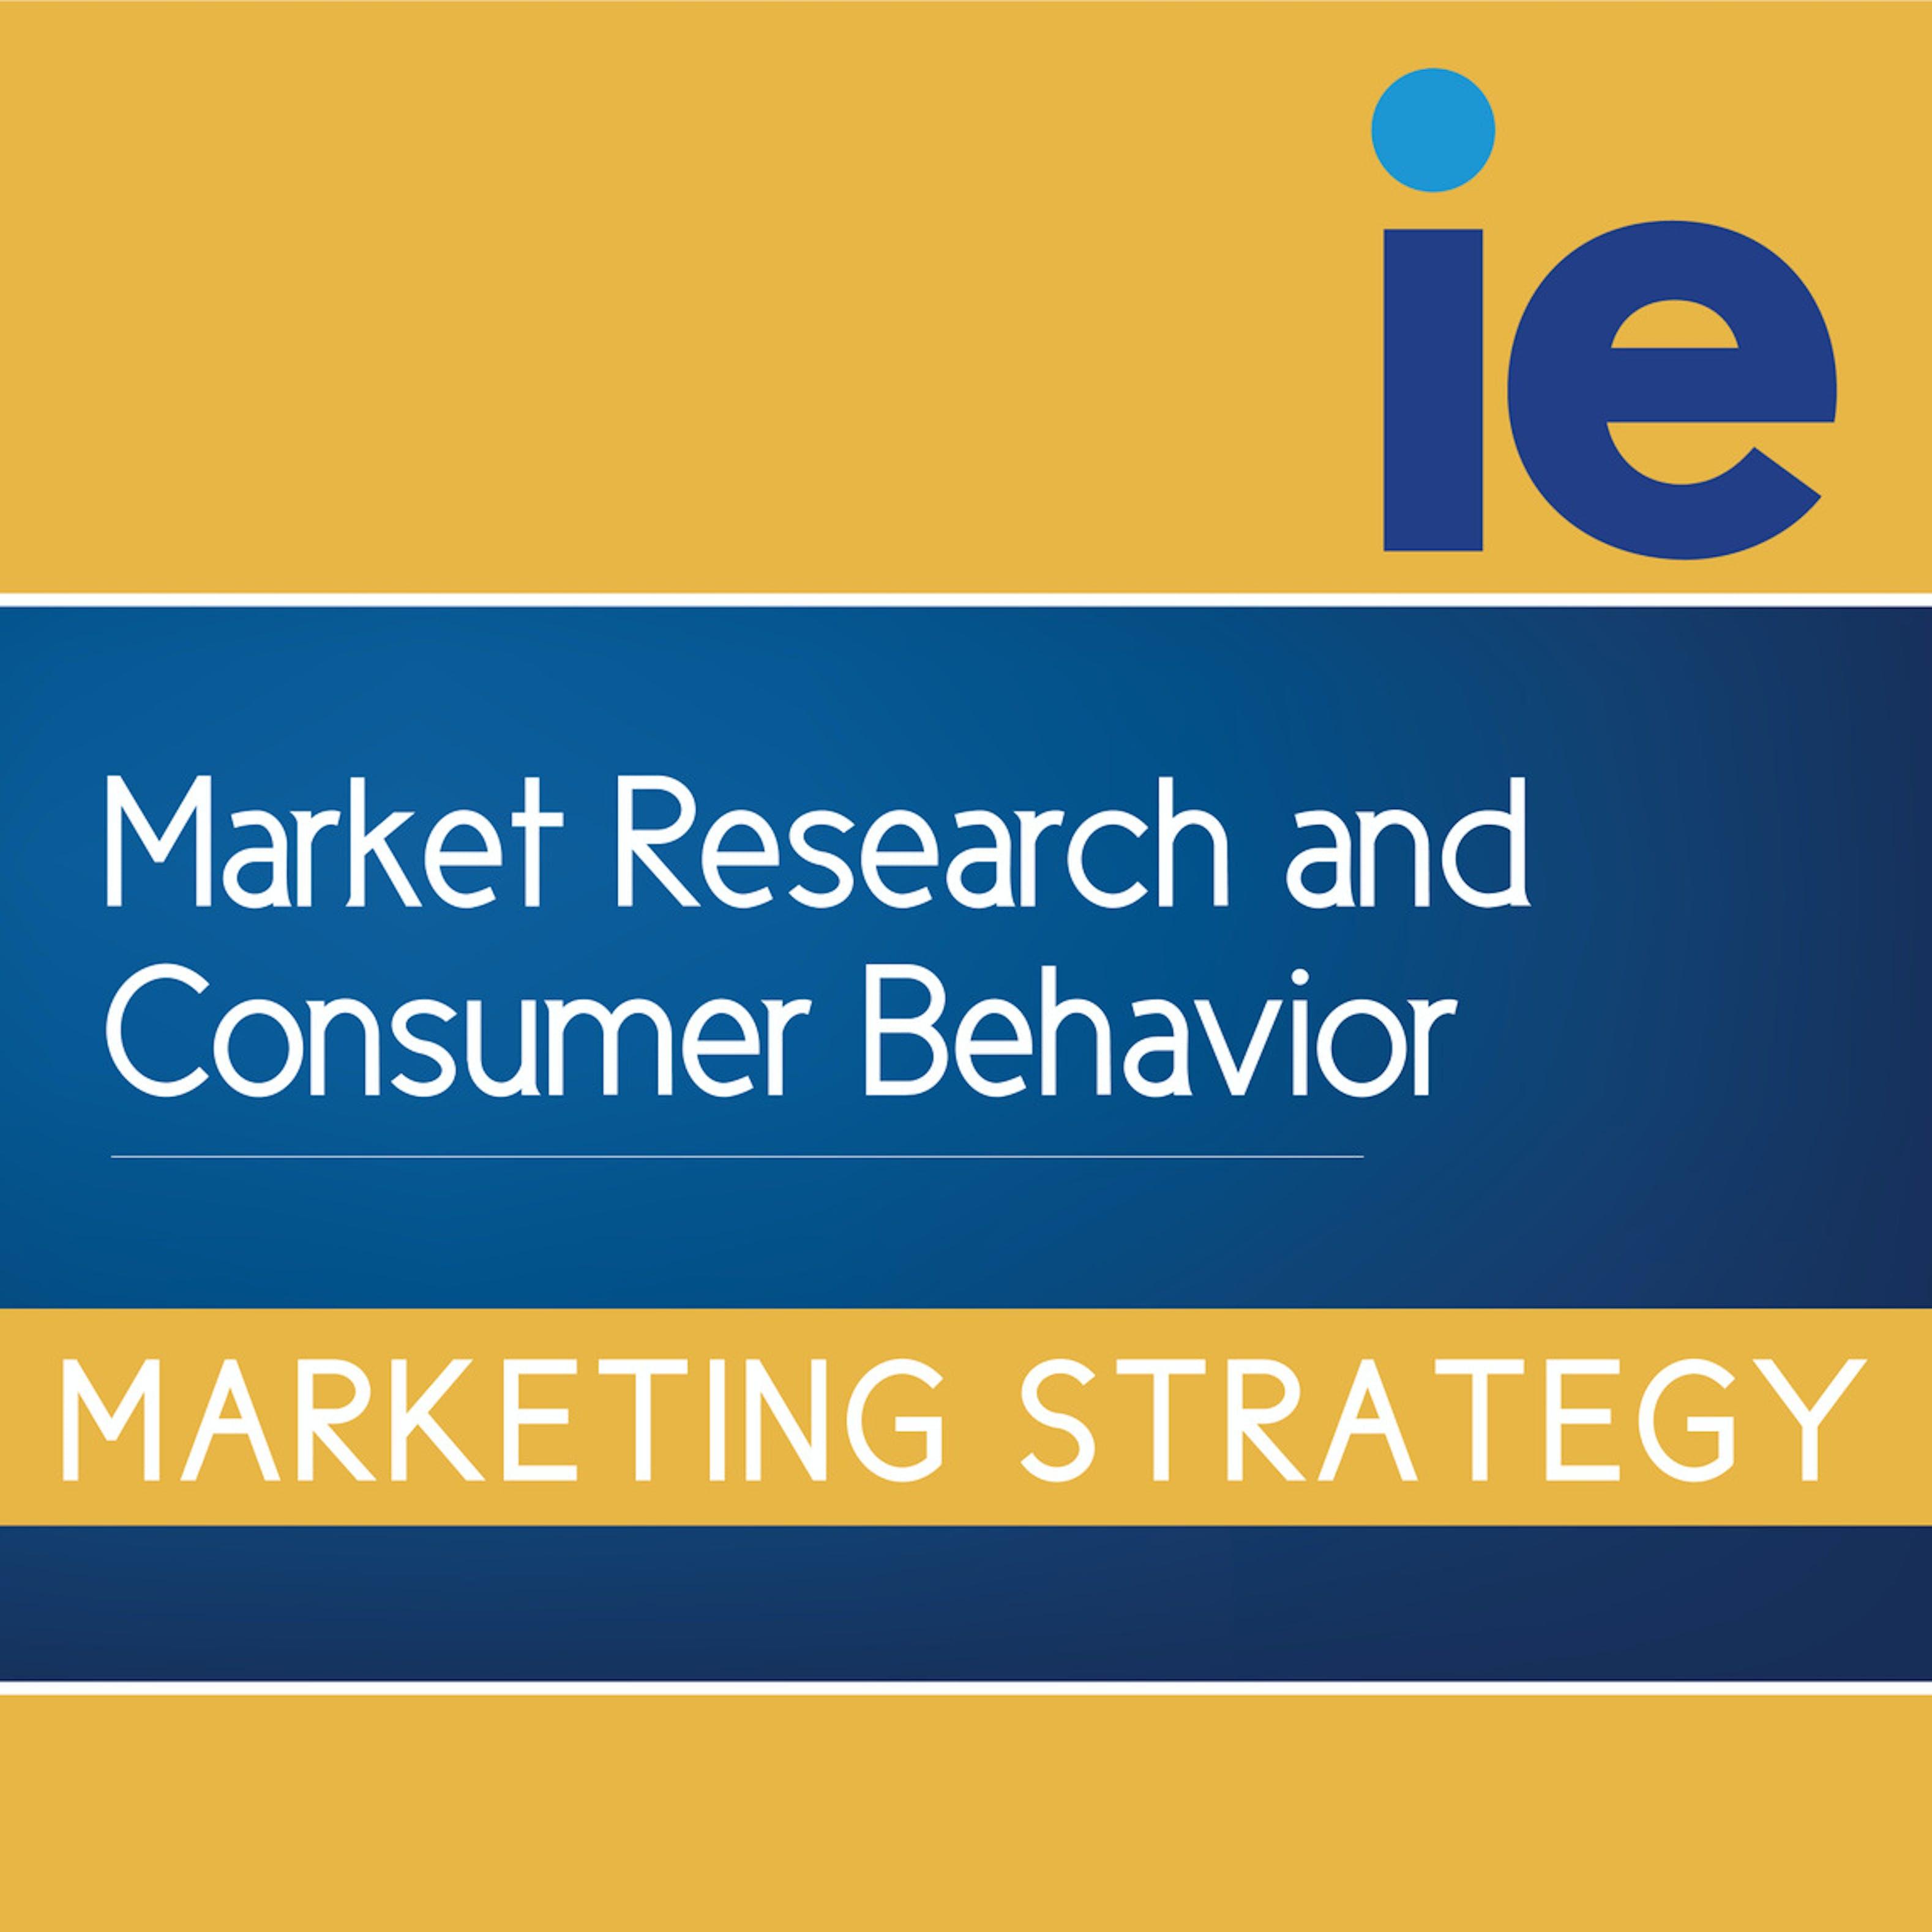 Market Research And Consumer Behavior Coursera